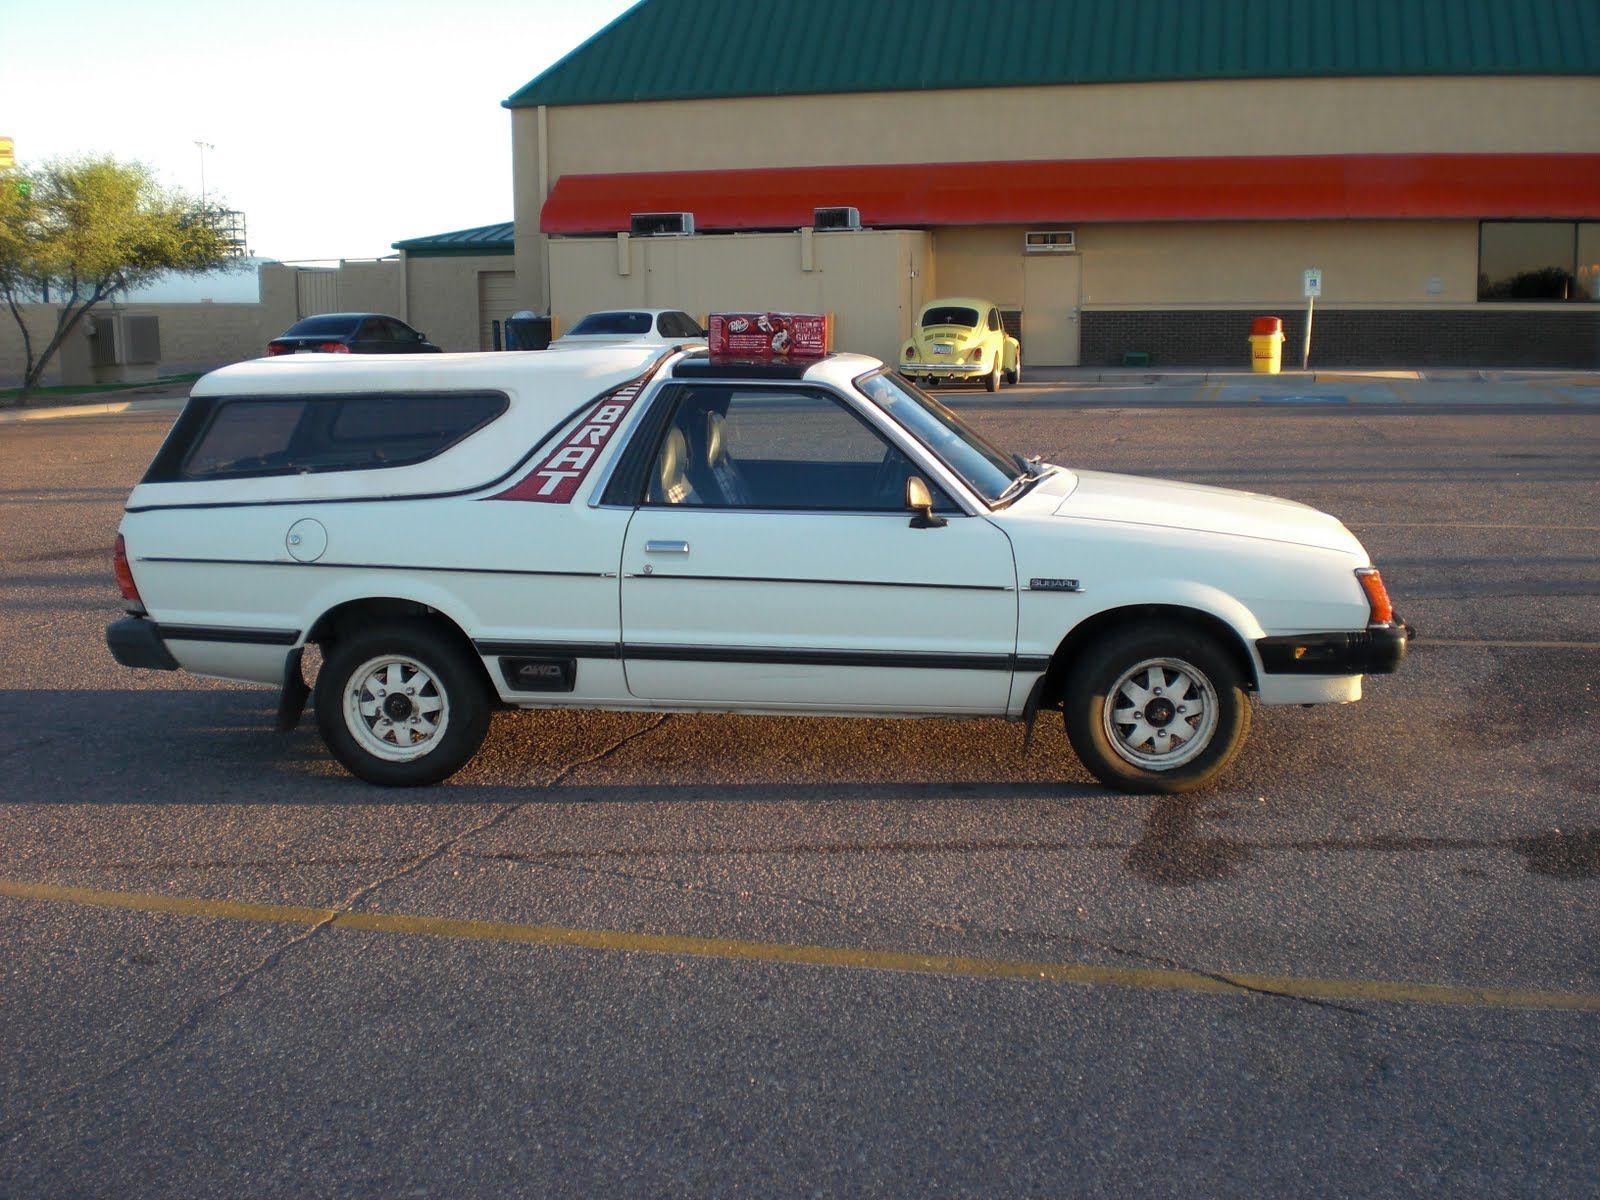 Subaru Brat 1982 Subaru Brat GL Vehicles Pinterest